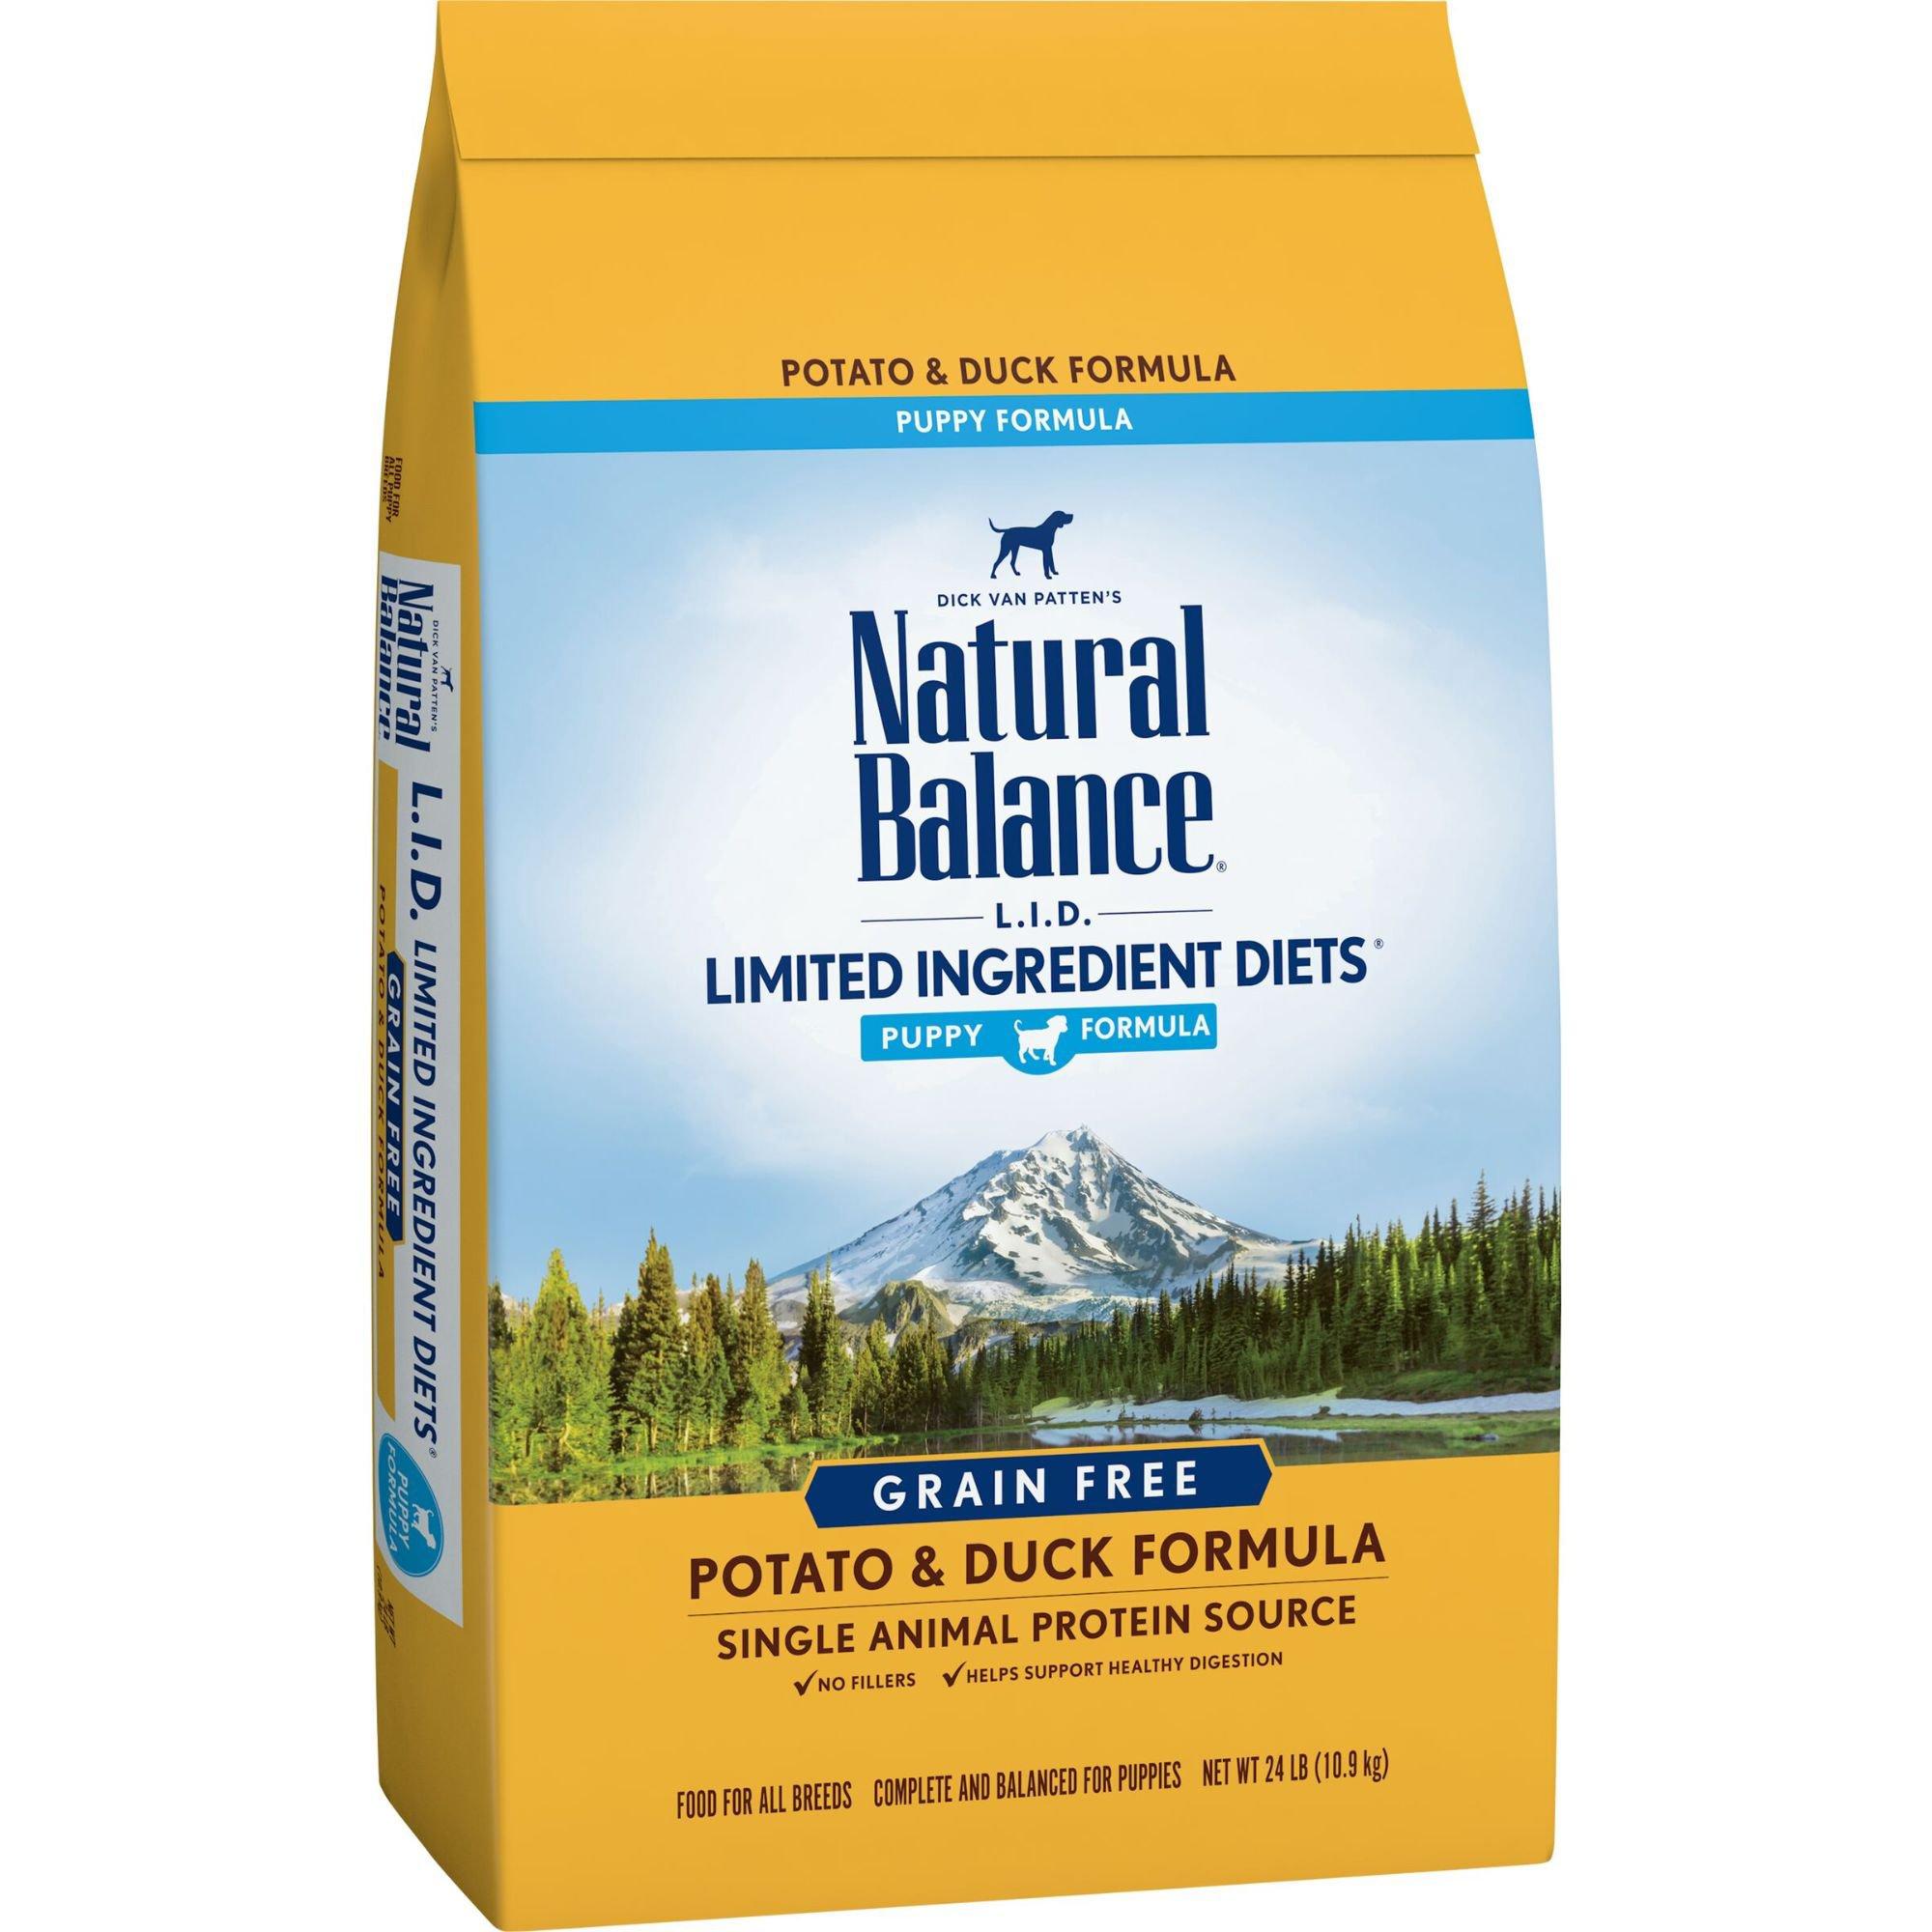 Natural Balance Puppy Food Petco